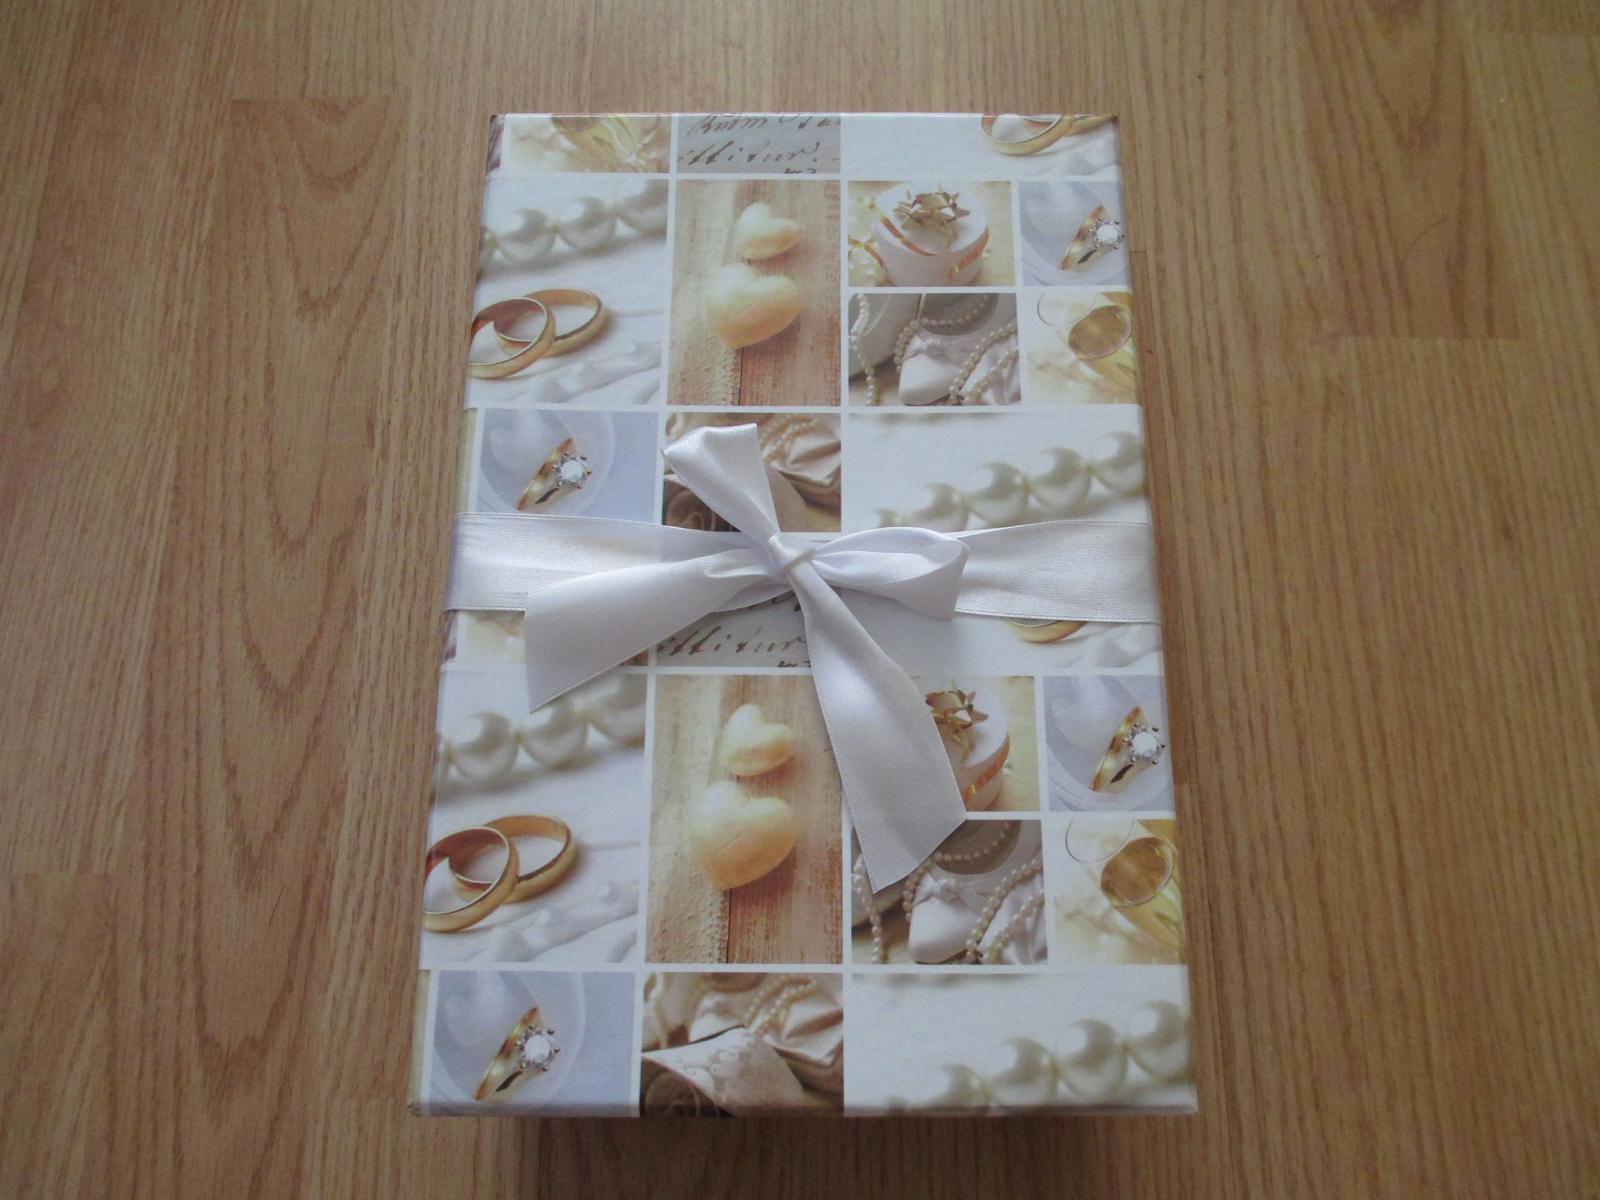 Svadobna krabica - Obrázok č. 1